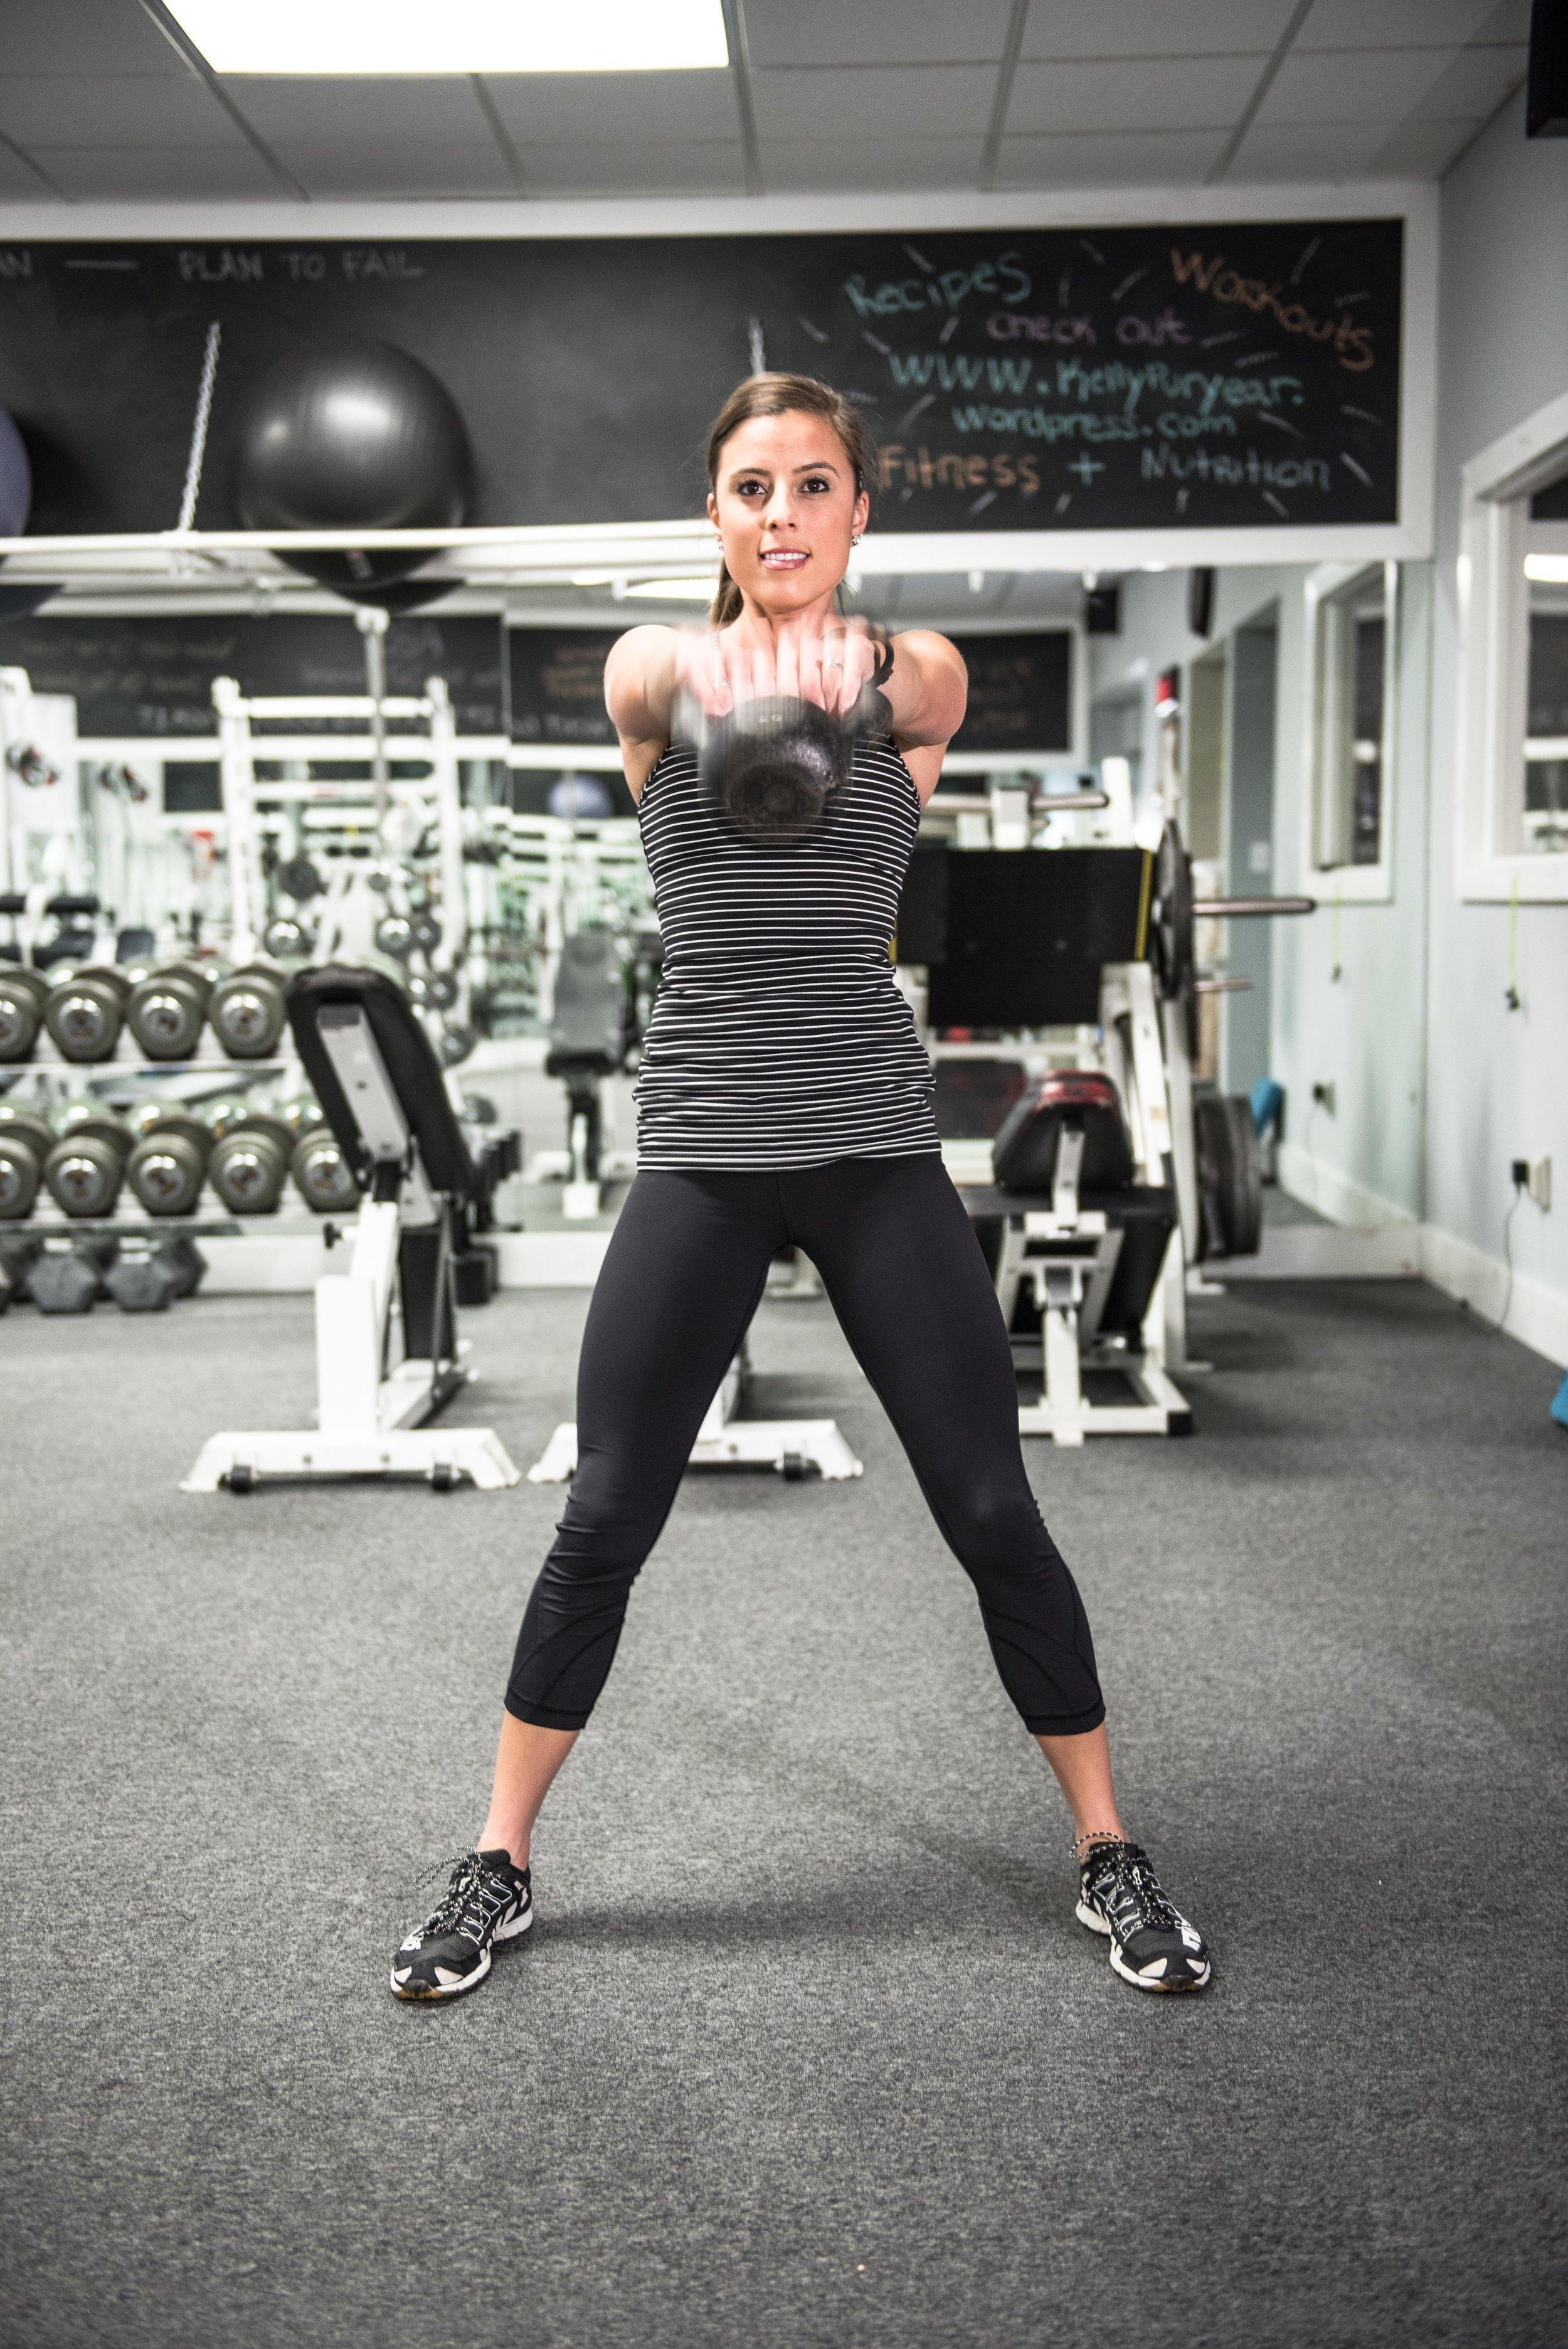 Full Body Kettle Bell Workout